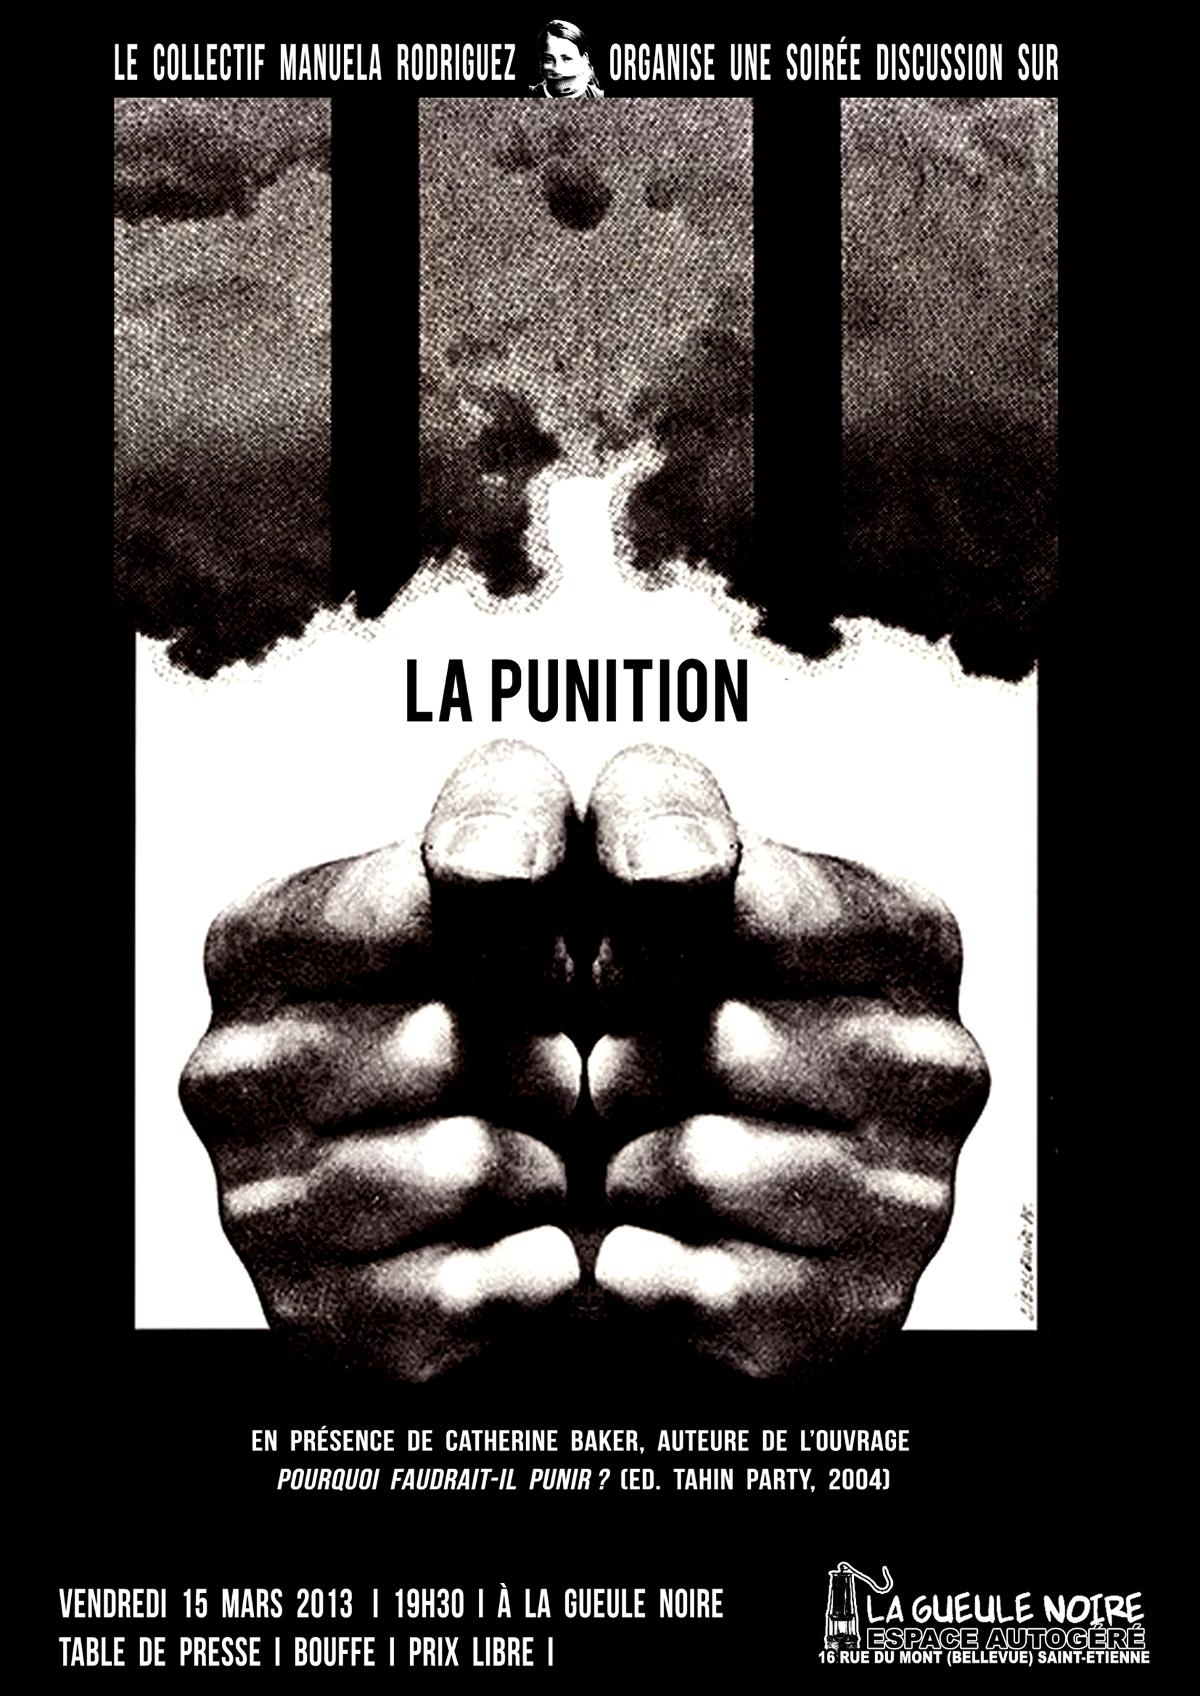 http://juralib.noblogs.org/files/2013/03/Soiree-punition.jpg